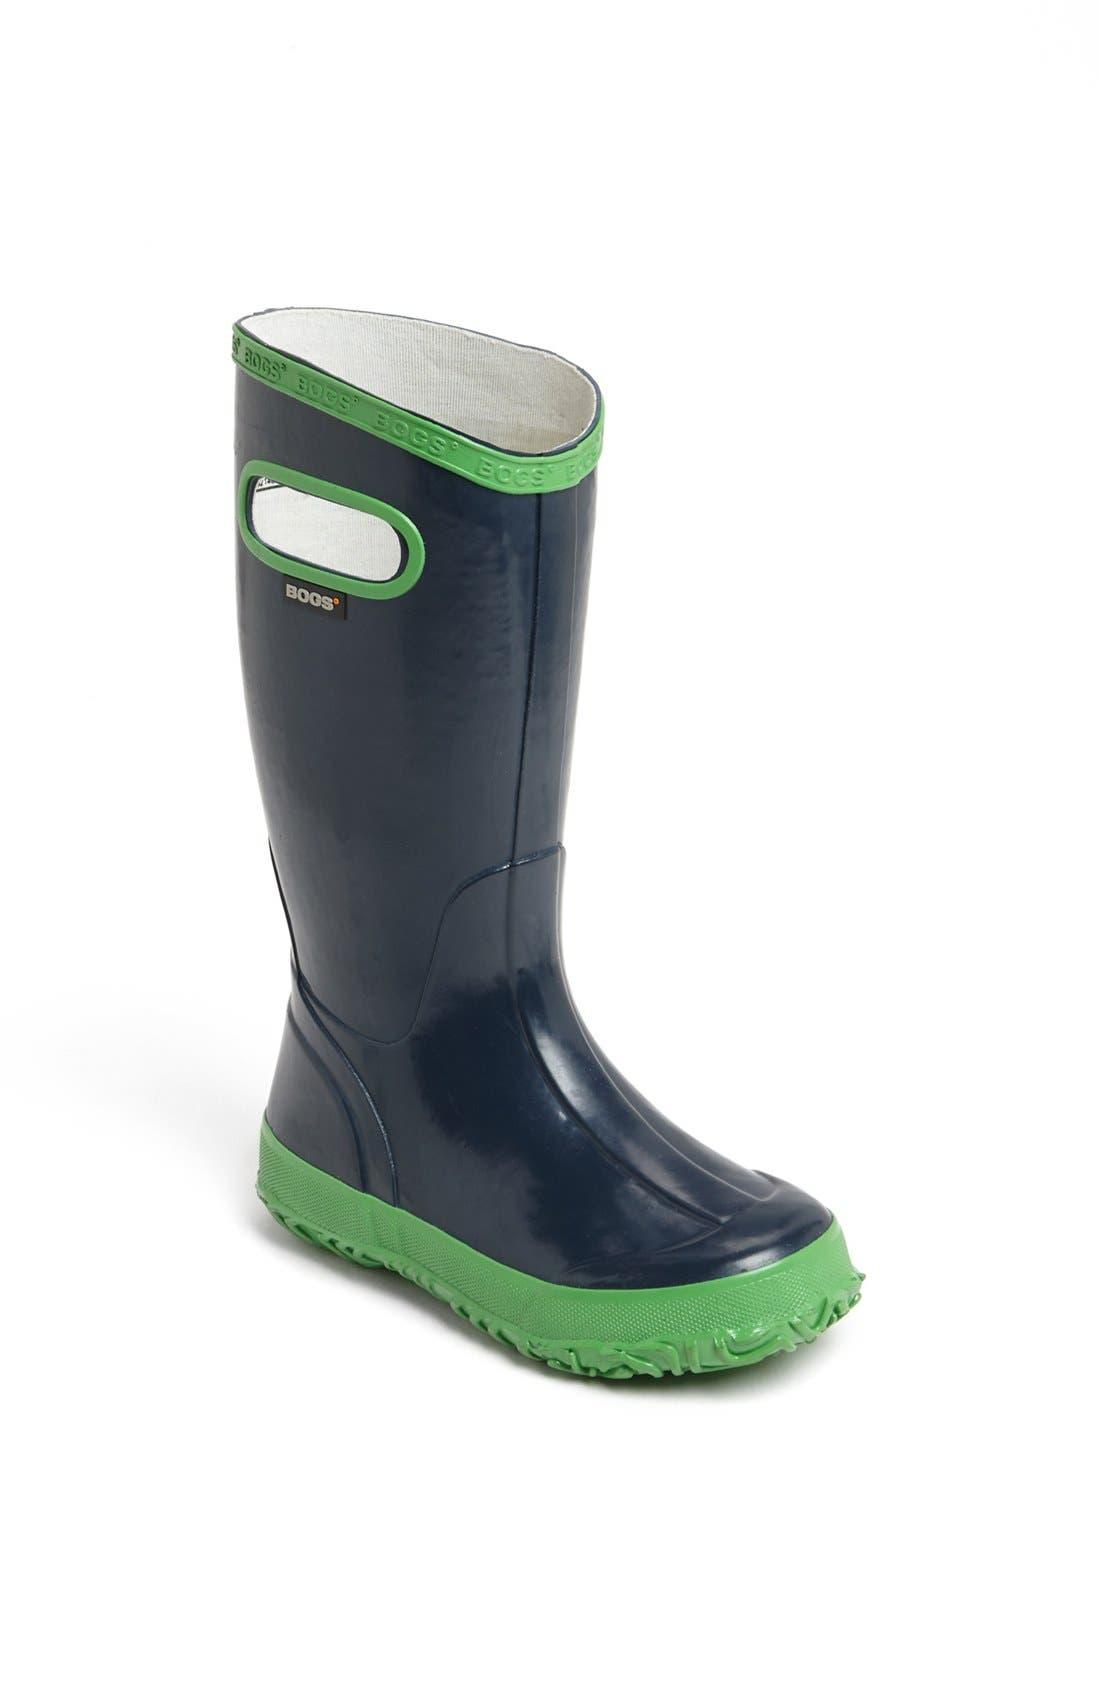 Bogs Rubber Rain Boot (Walker, Toddler, Little Kid & Big Kid)